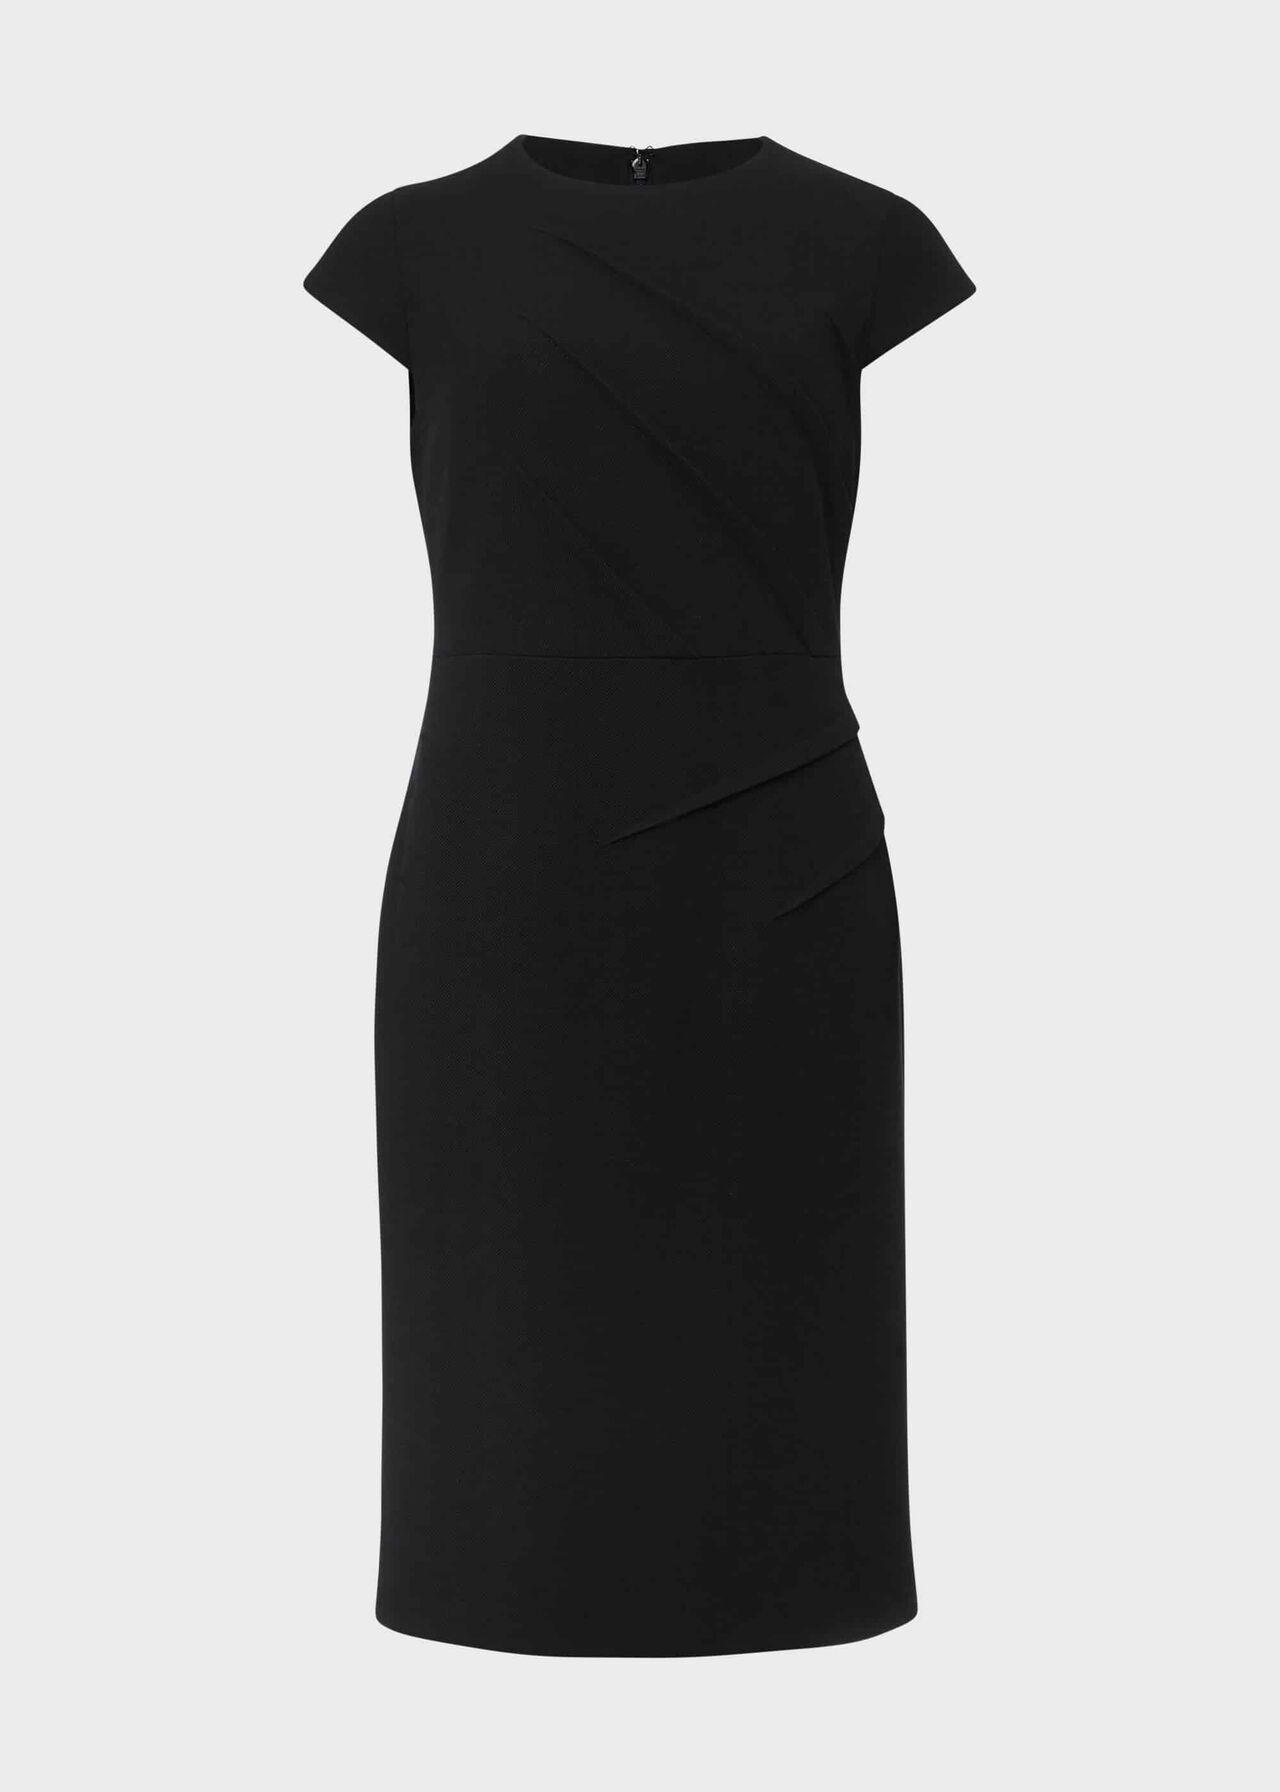 Petite Ophelia Shift Dress Black